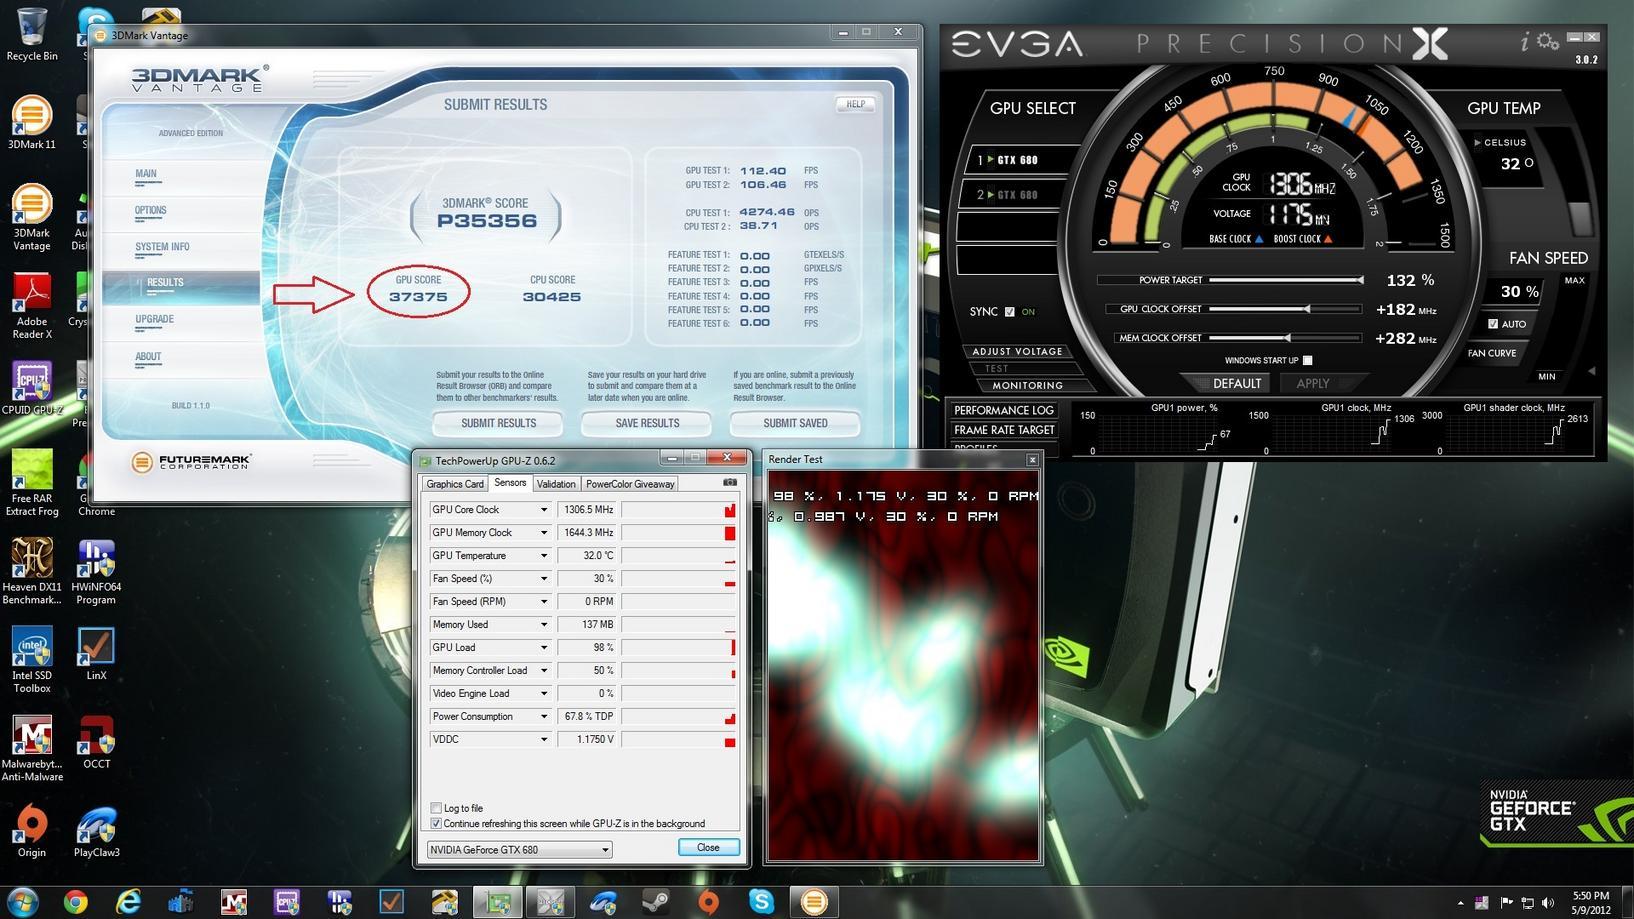 3DmarkV 1306_1644 GPU37375.jpg